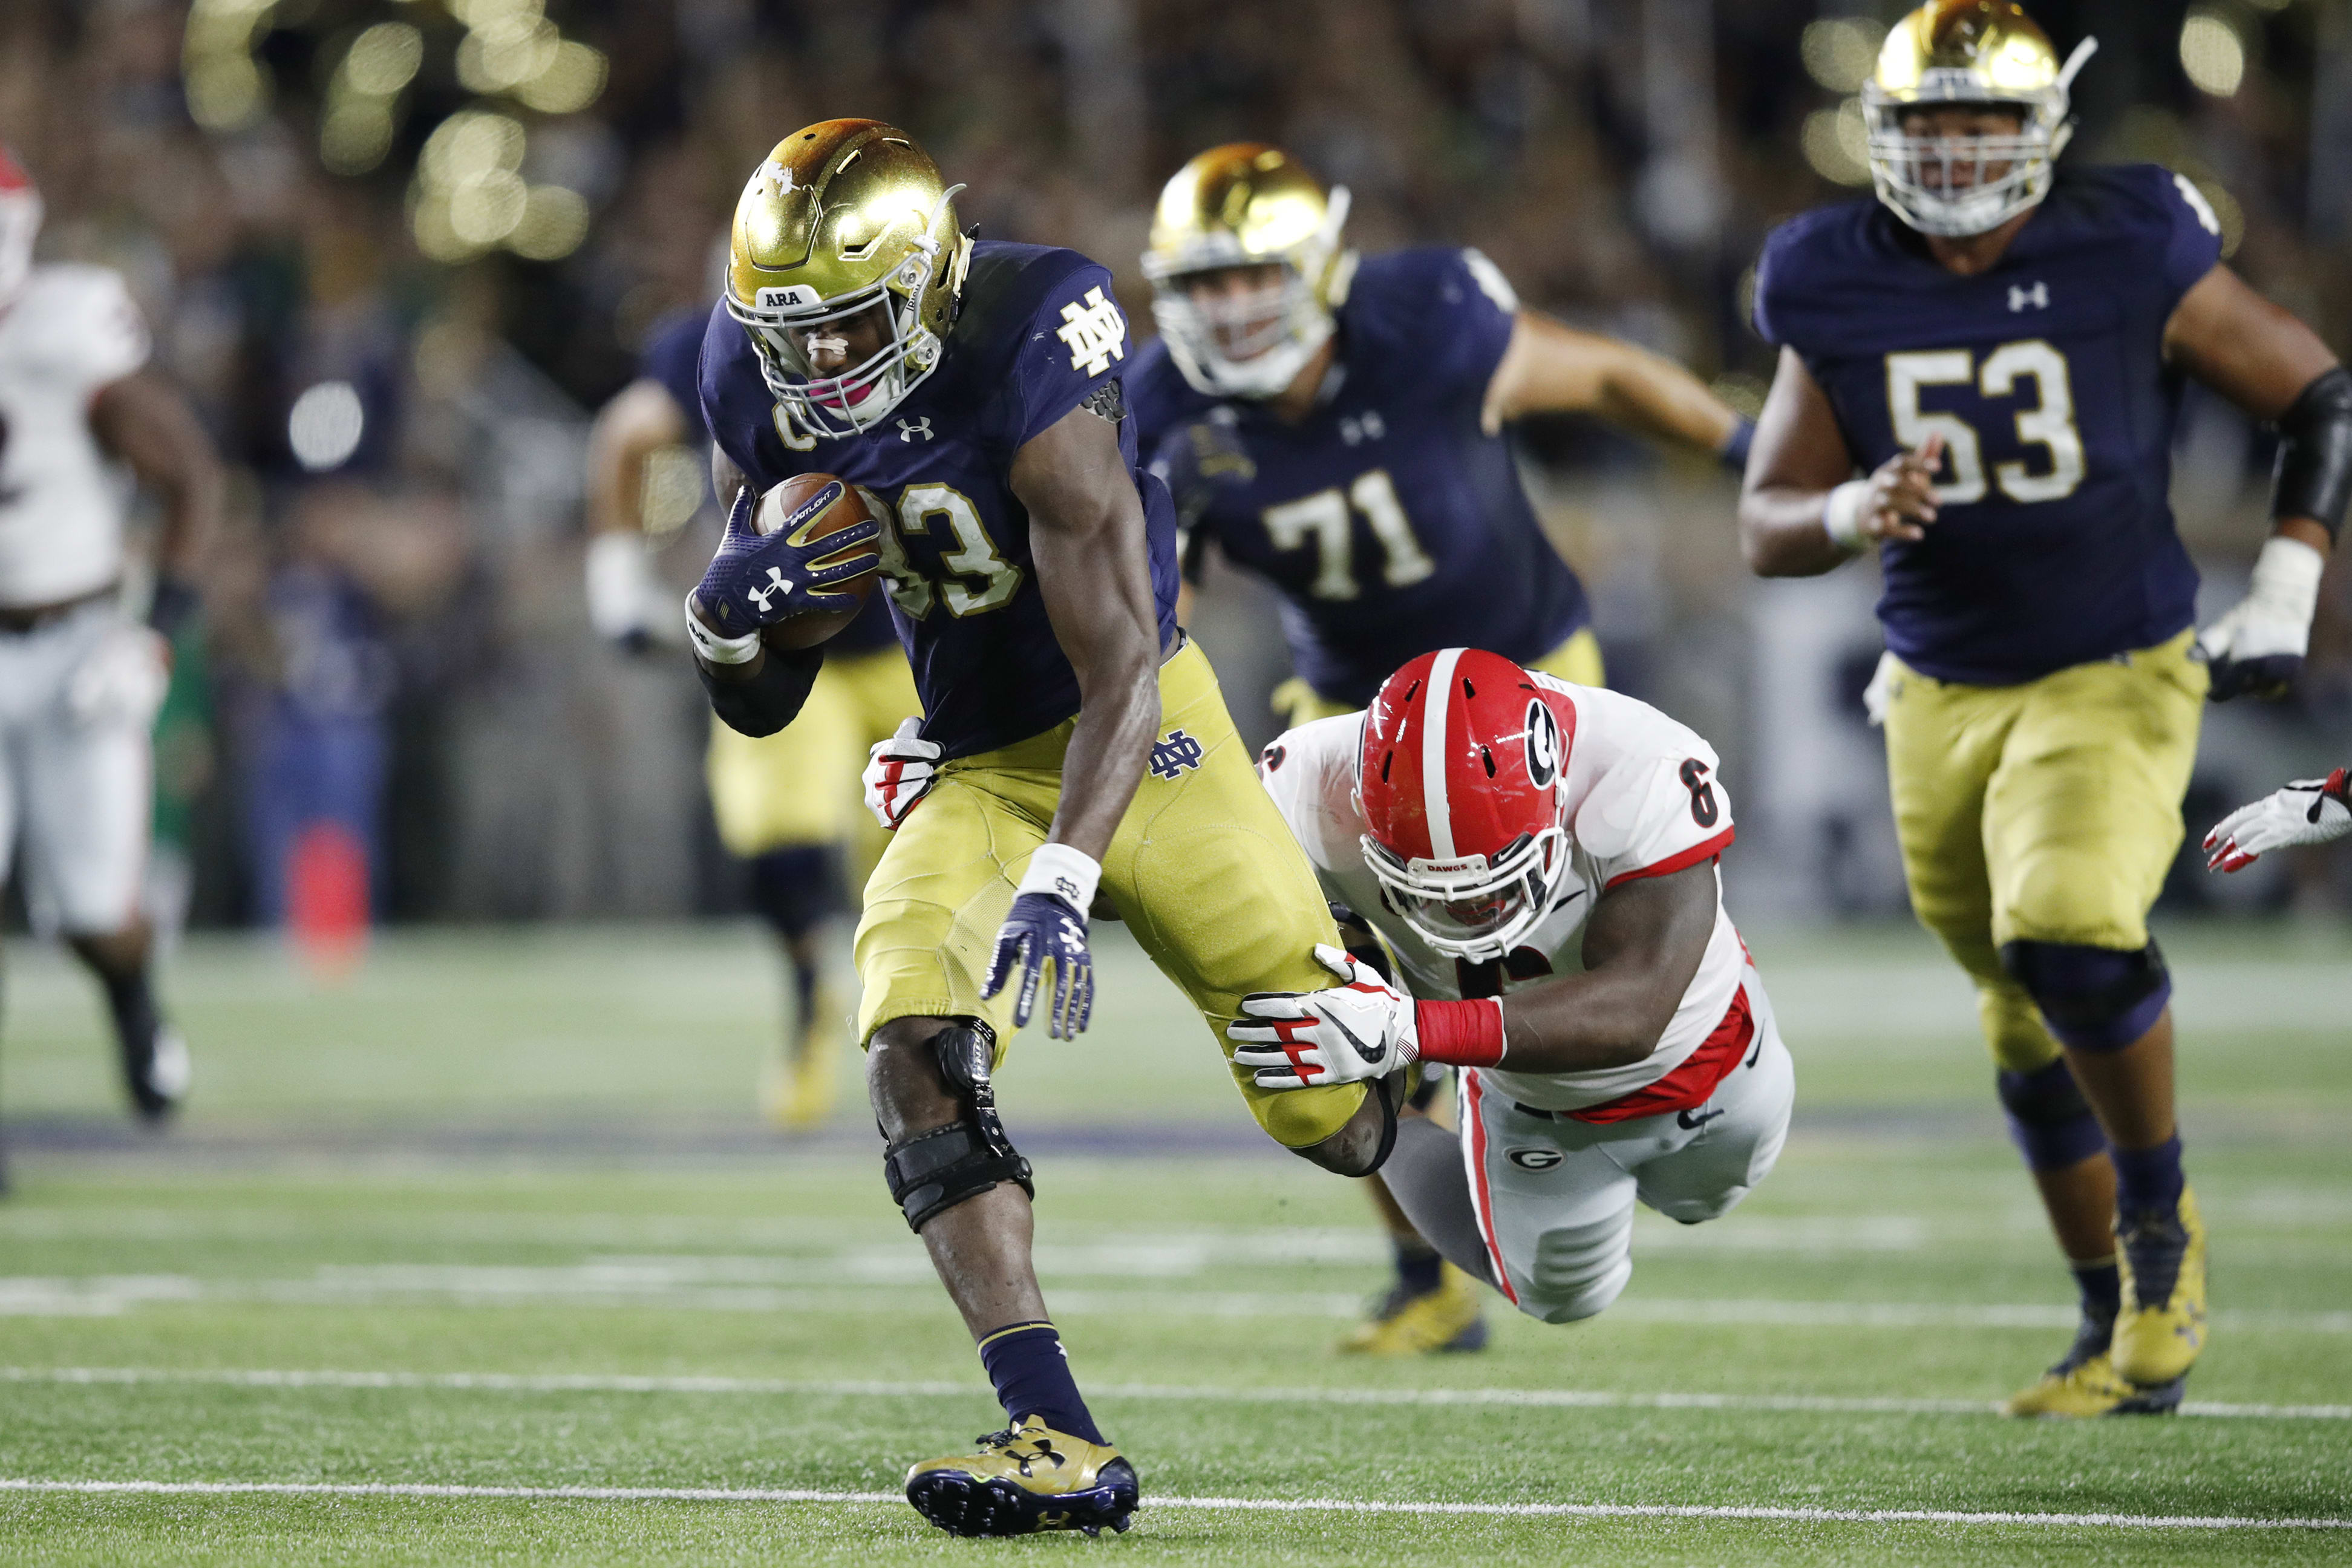 Notre Dame Football Top 5 Running Backs In School History